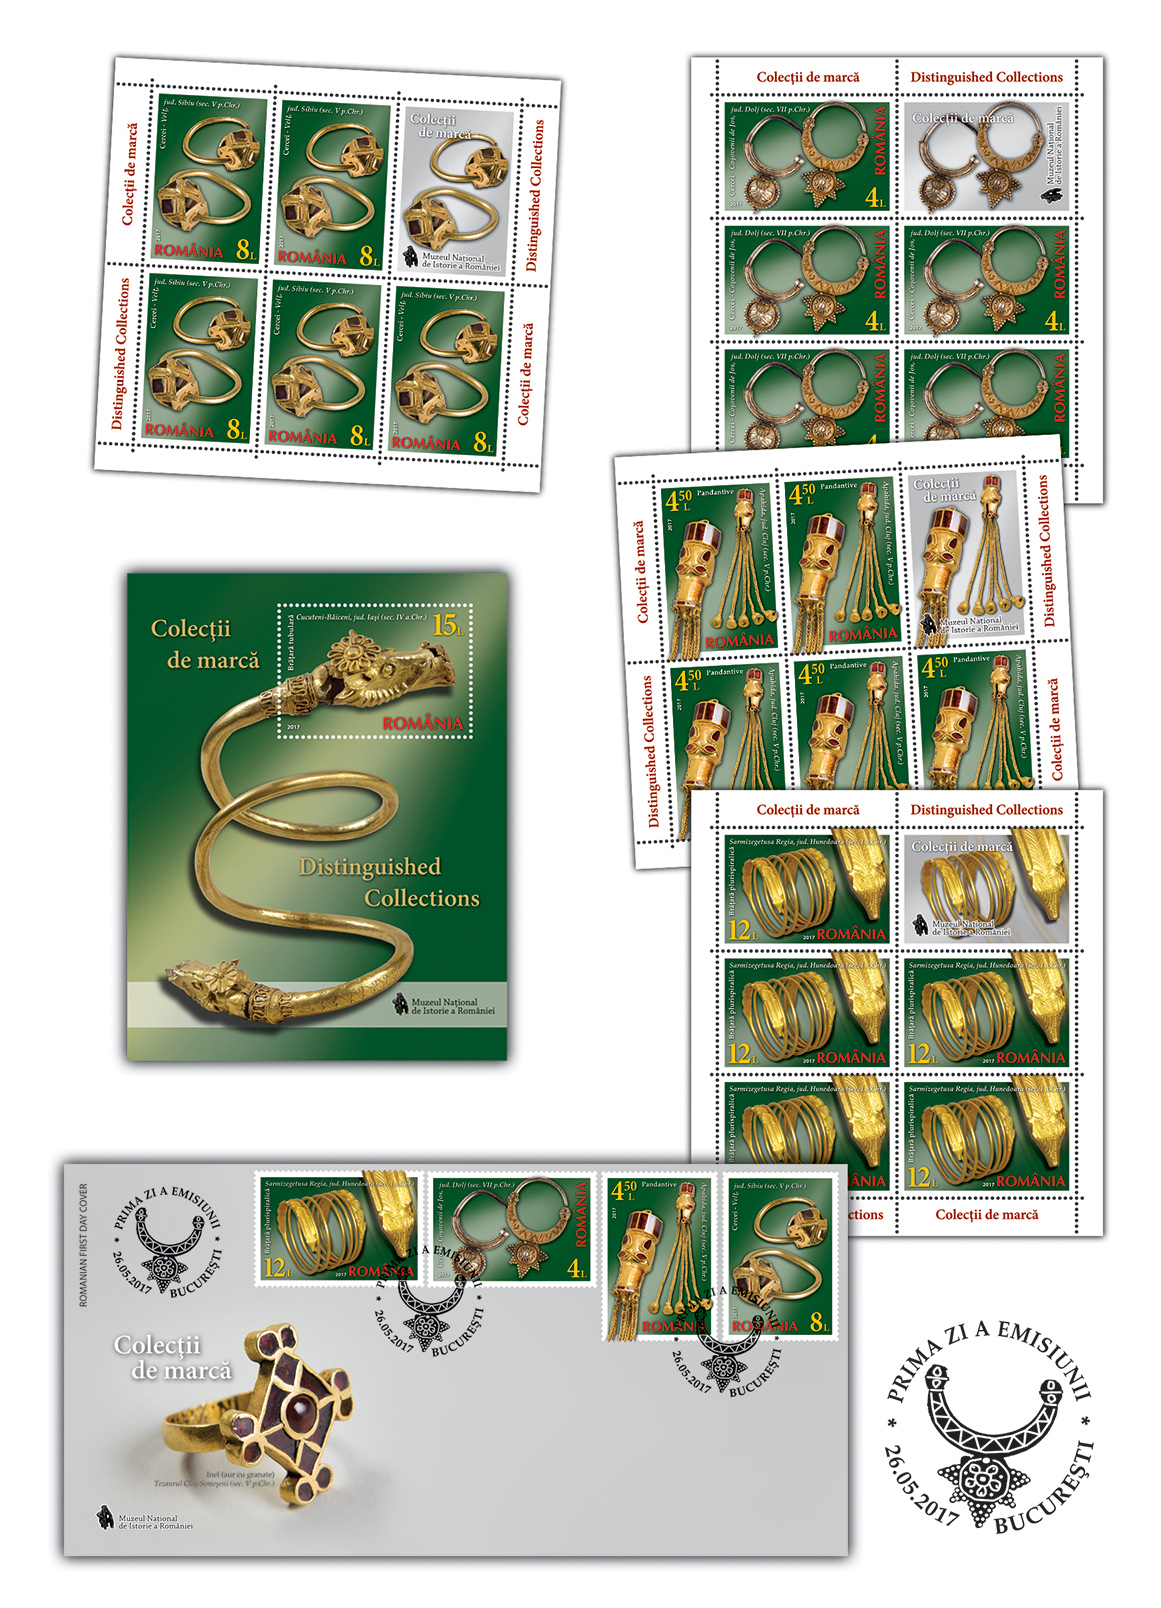 Colectii de marca_ Distinguished Collections